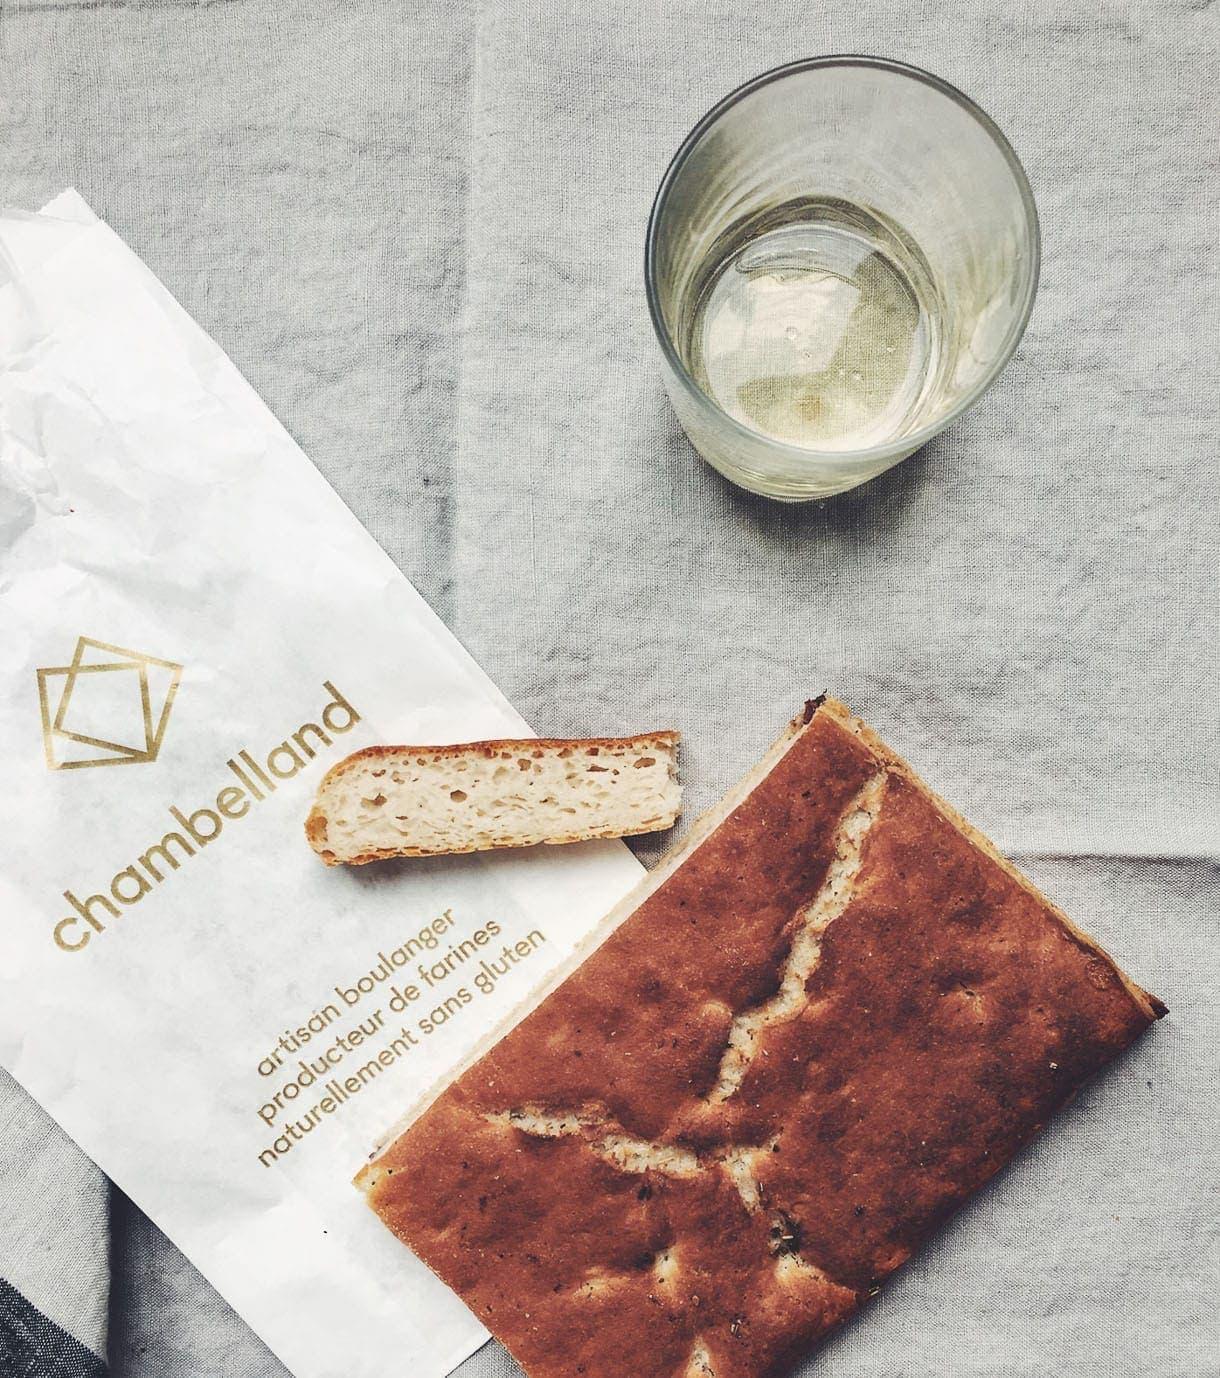 Chambelland - Paris - all naturally gluten free bakery